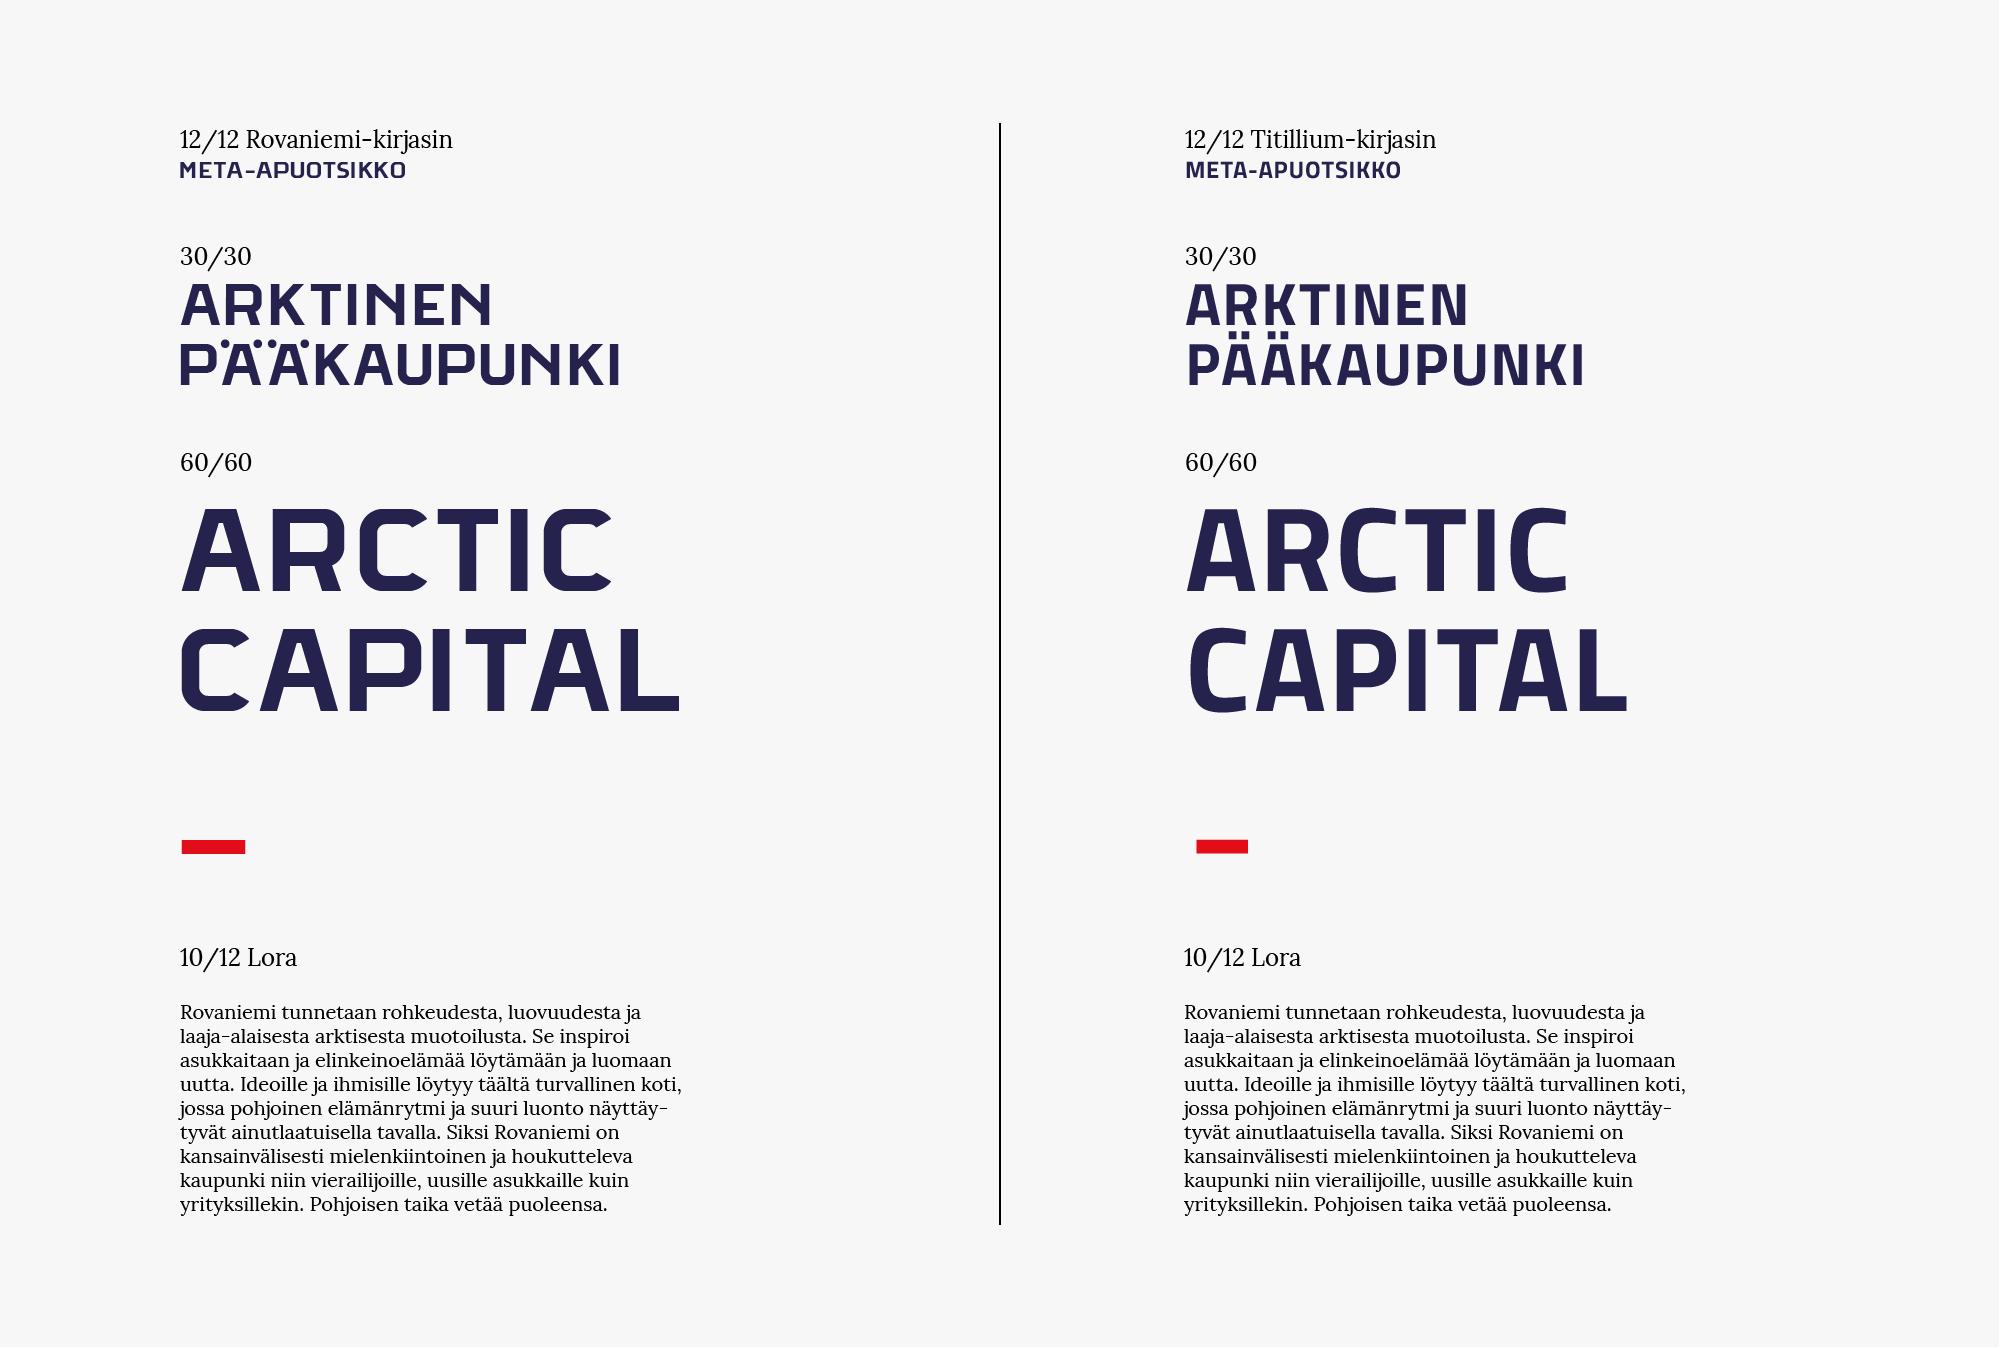 Typografia-tekstikoko